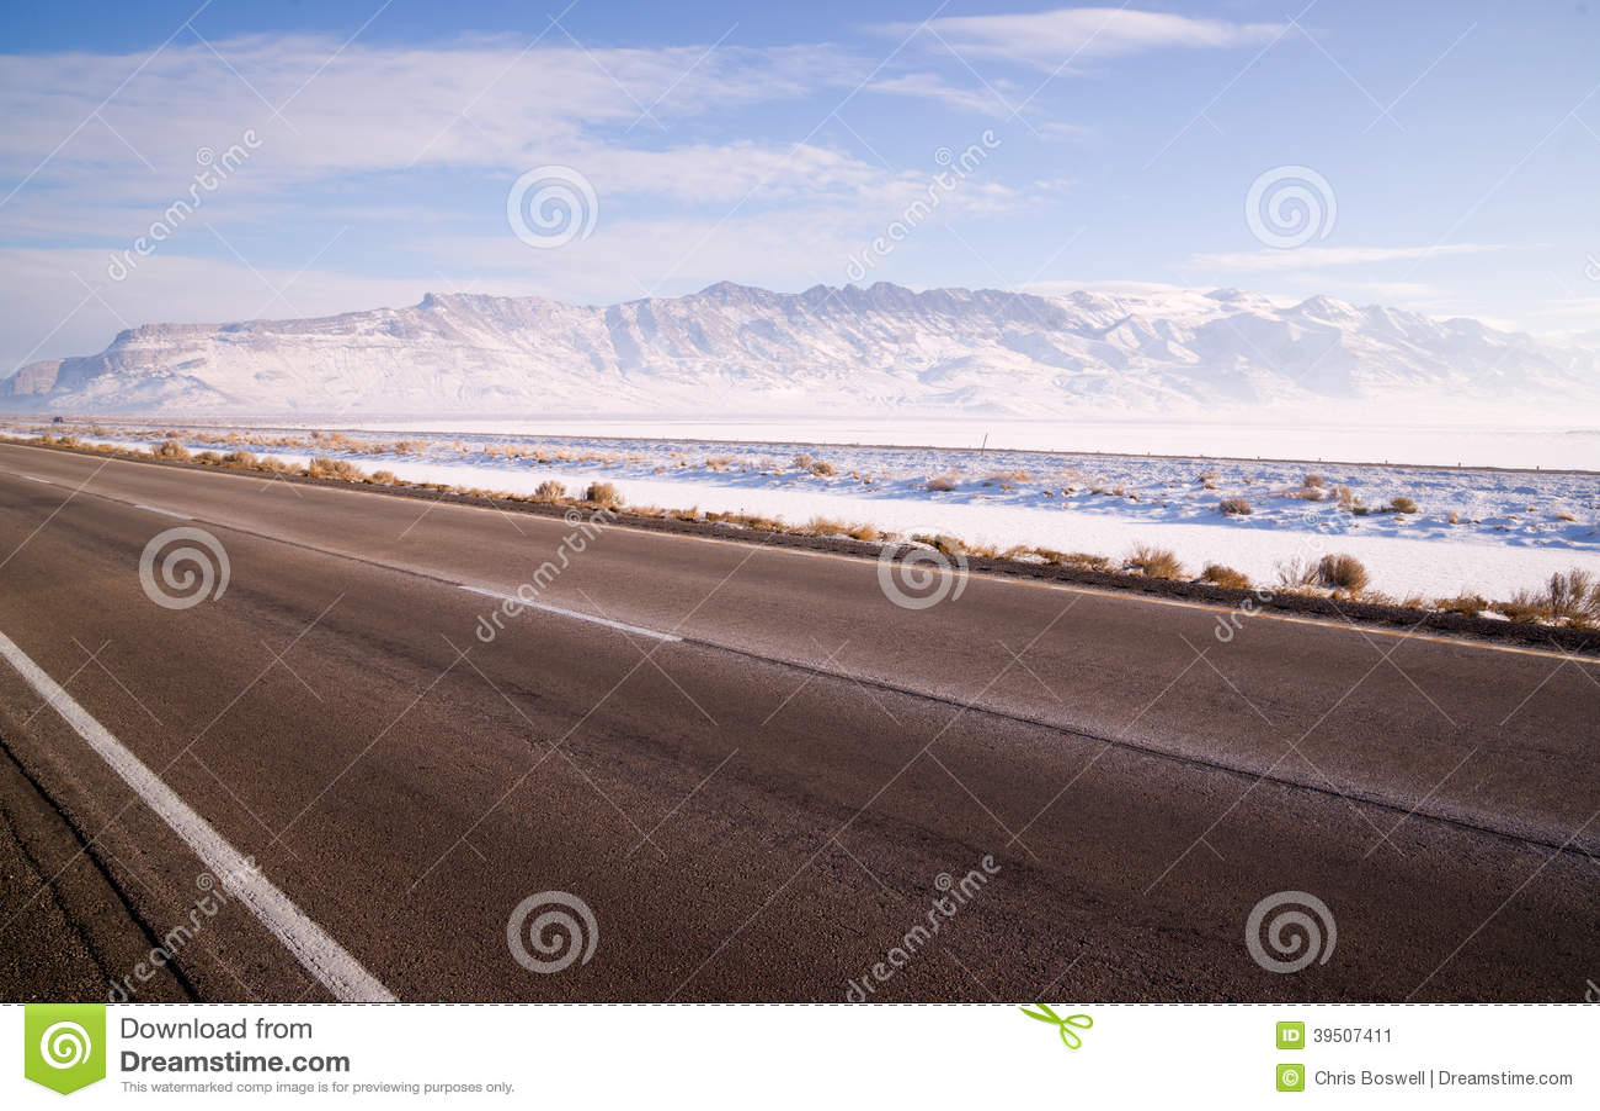 Lonesome Road Winter Freeze Utah Mountain Highway Salt Flats